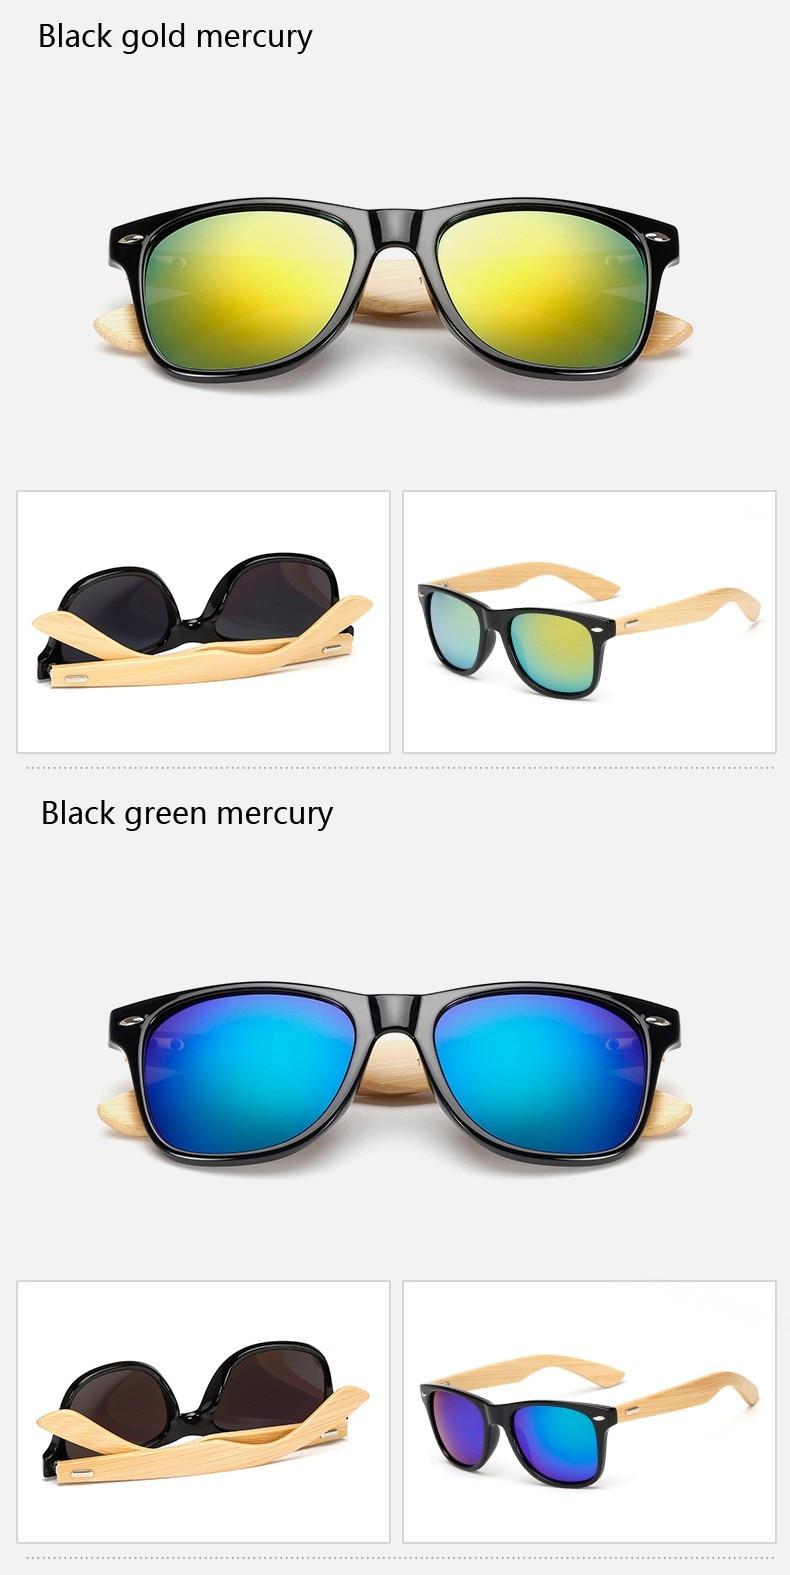 Ralferty Retro Wood Sunglasses Men Bamboo Sunglass Women Brand Design Sport Goggles Gold Mirror Sun Glasses Shades lunette oculo 10